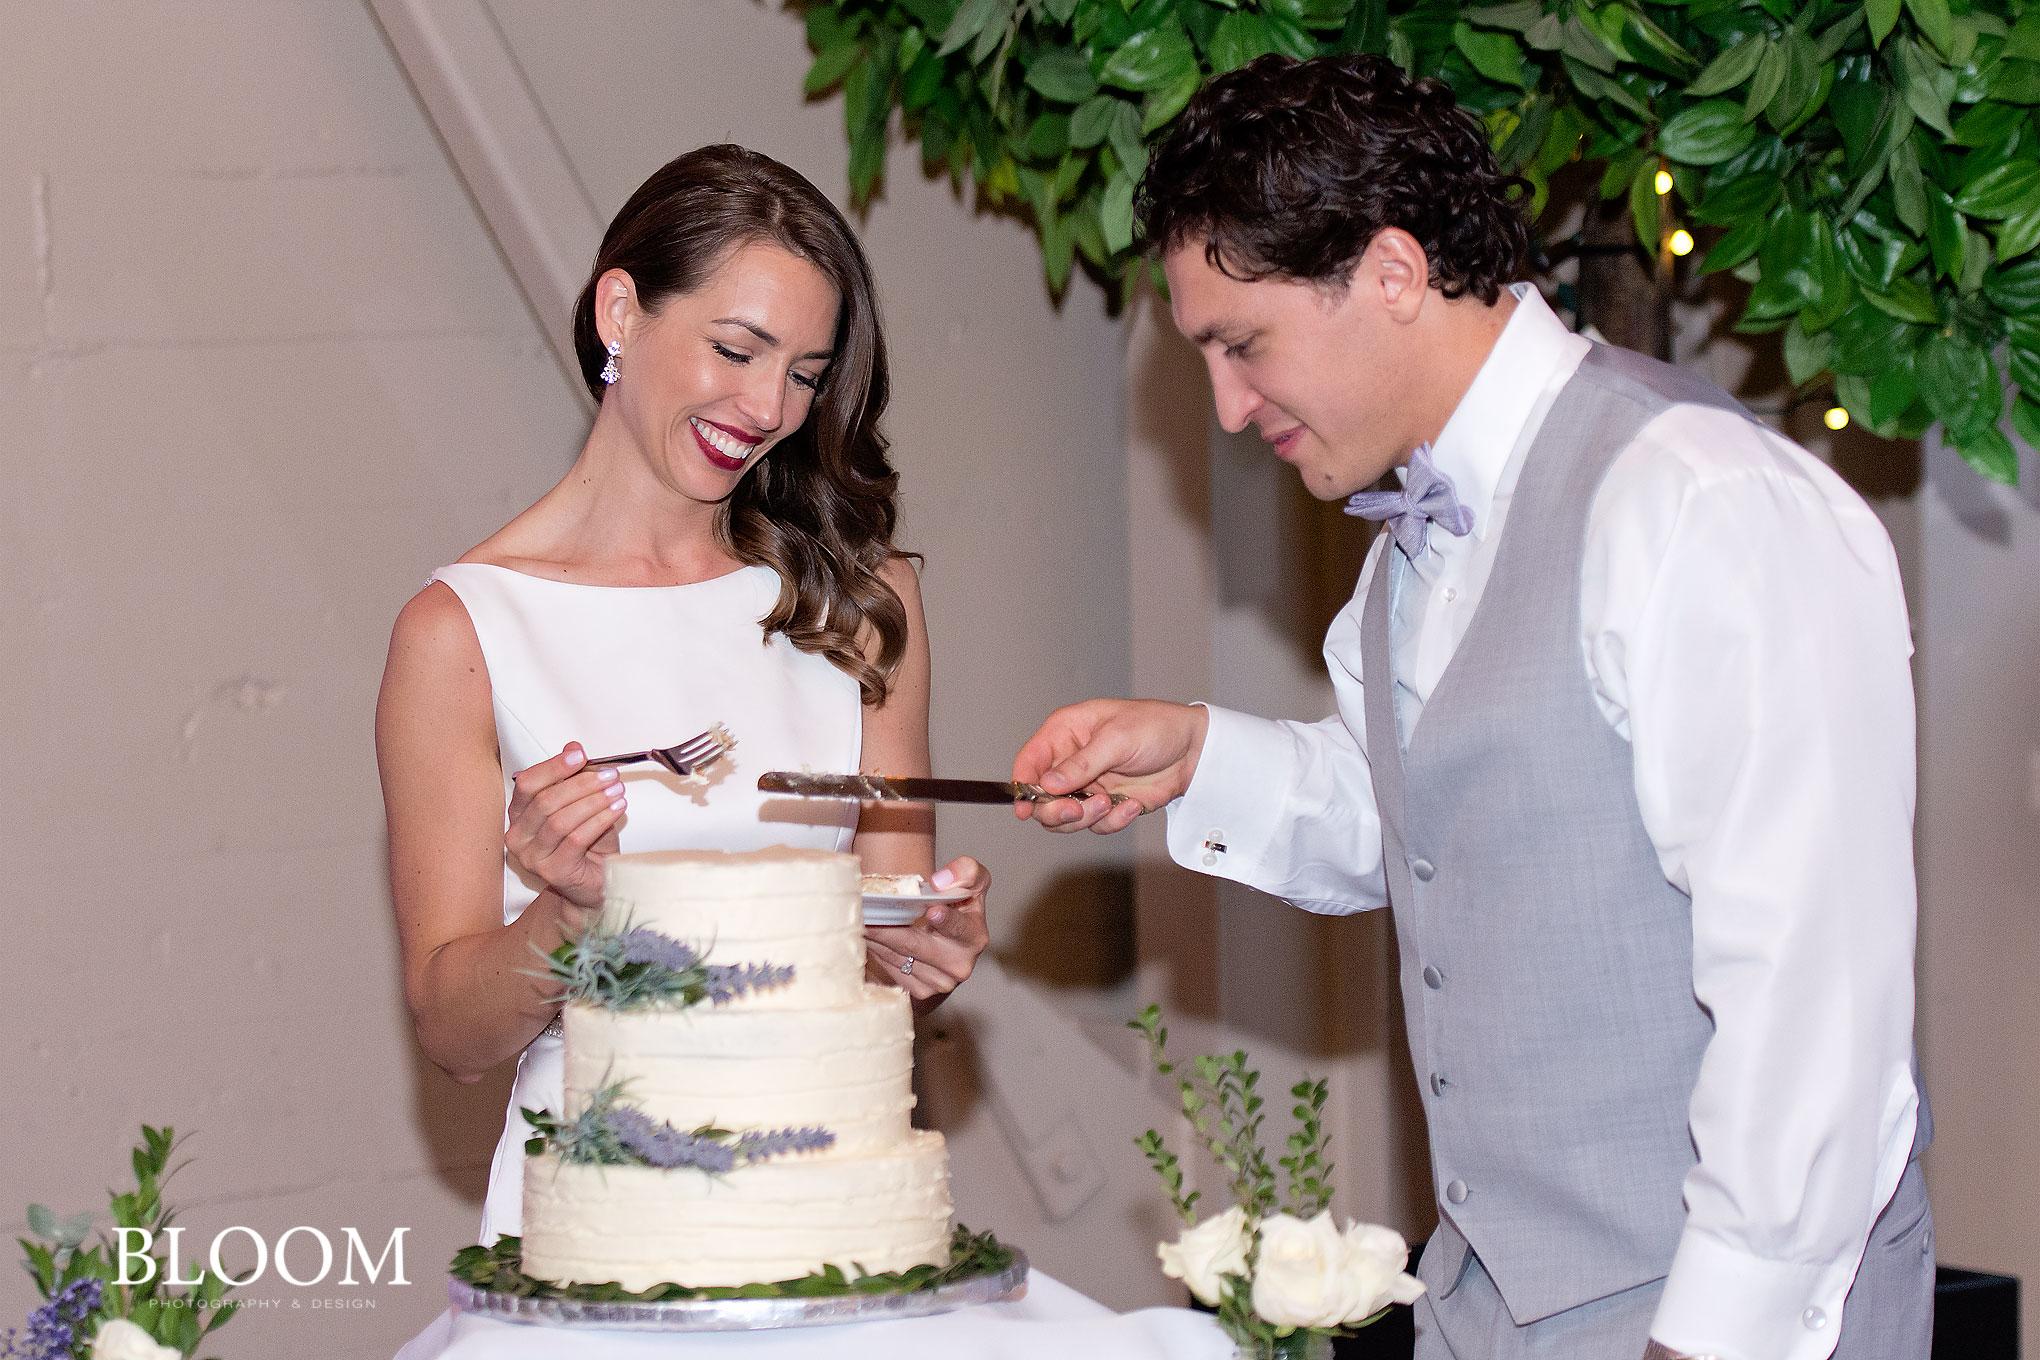 portland_oregon_wedding_photographer_san_antonio_texas_bloom_231016_NMM_7230.jpg